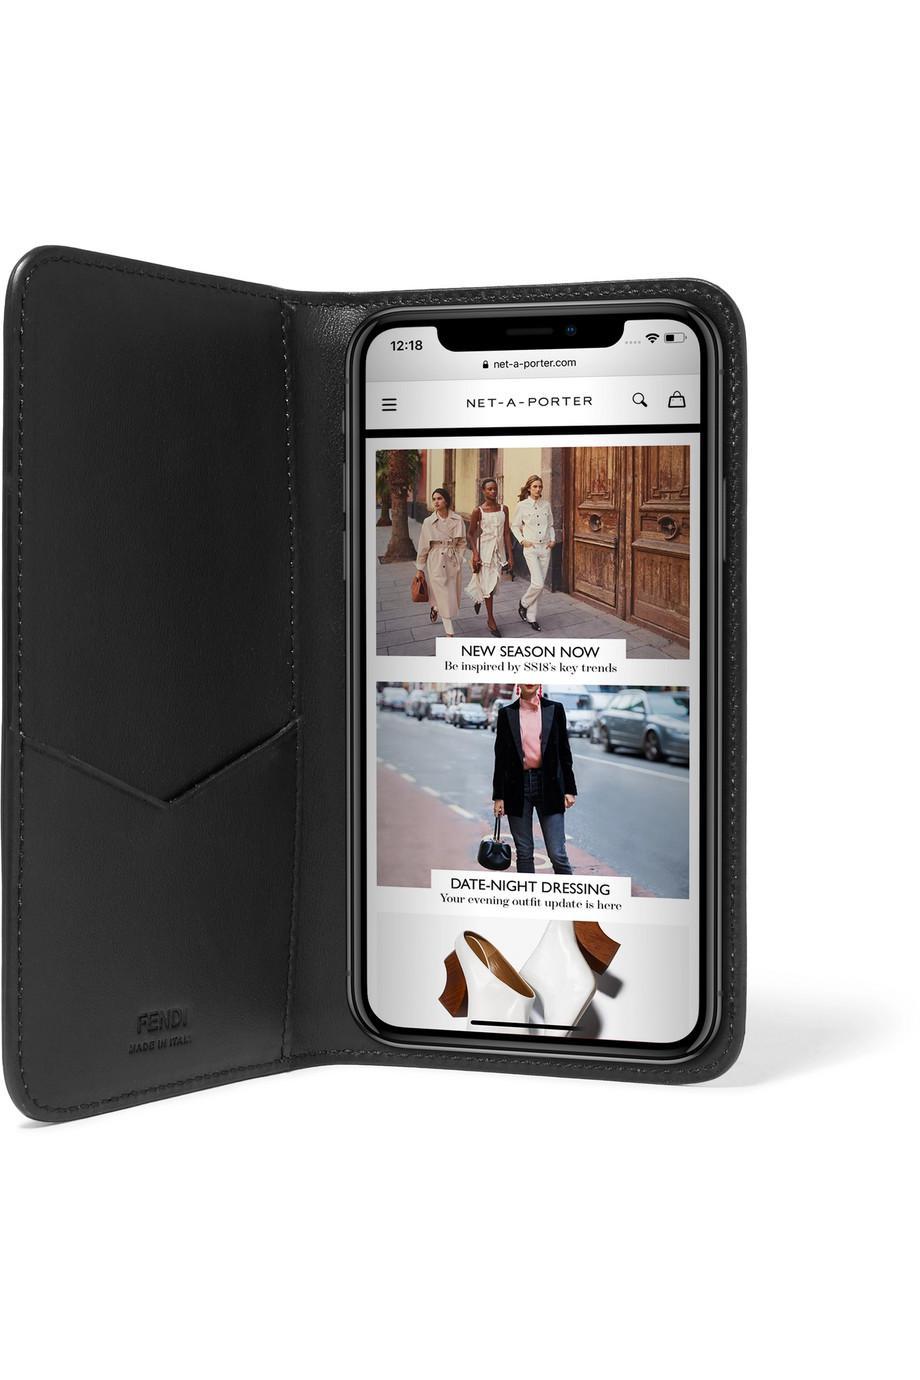 Fendi Floqué Cuir Iphone X Cas - Marron Boutique Vente En Ligne y8TPh2eE